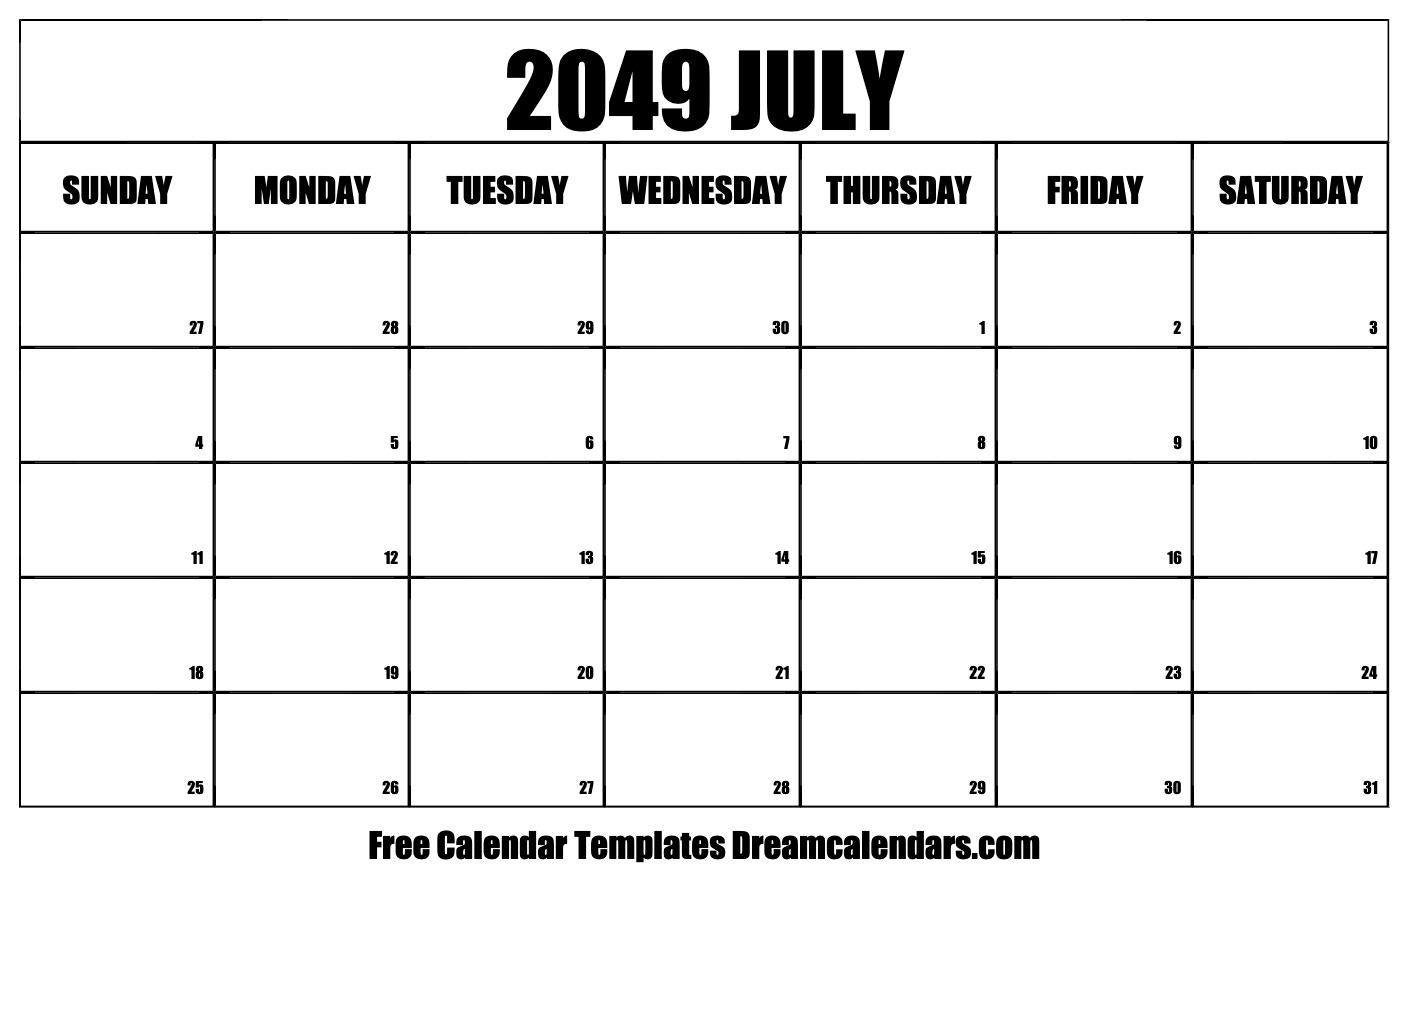 Printable July 2049 Calendar